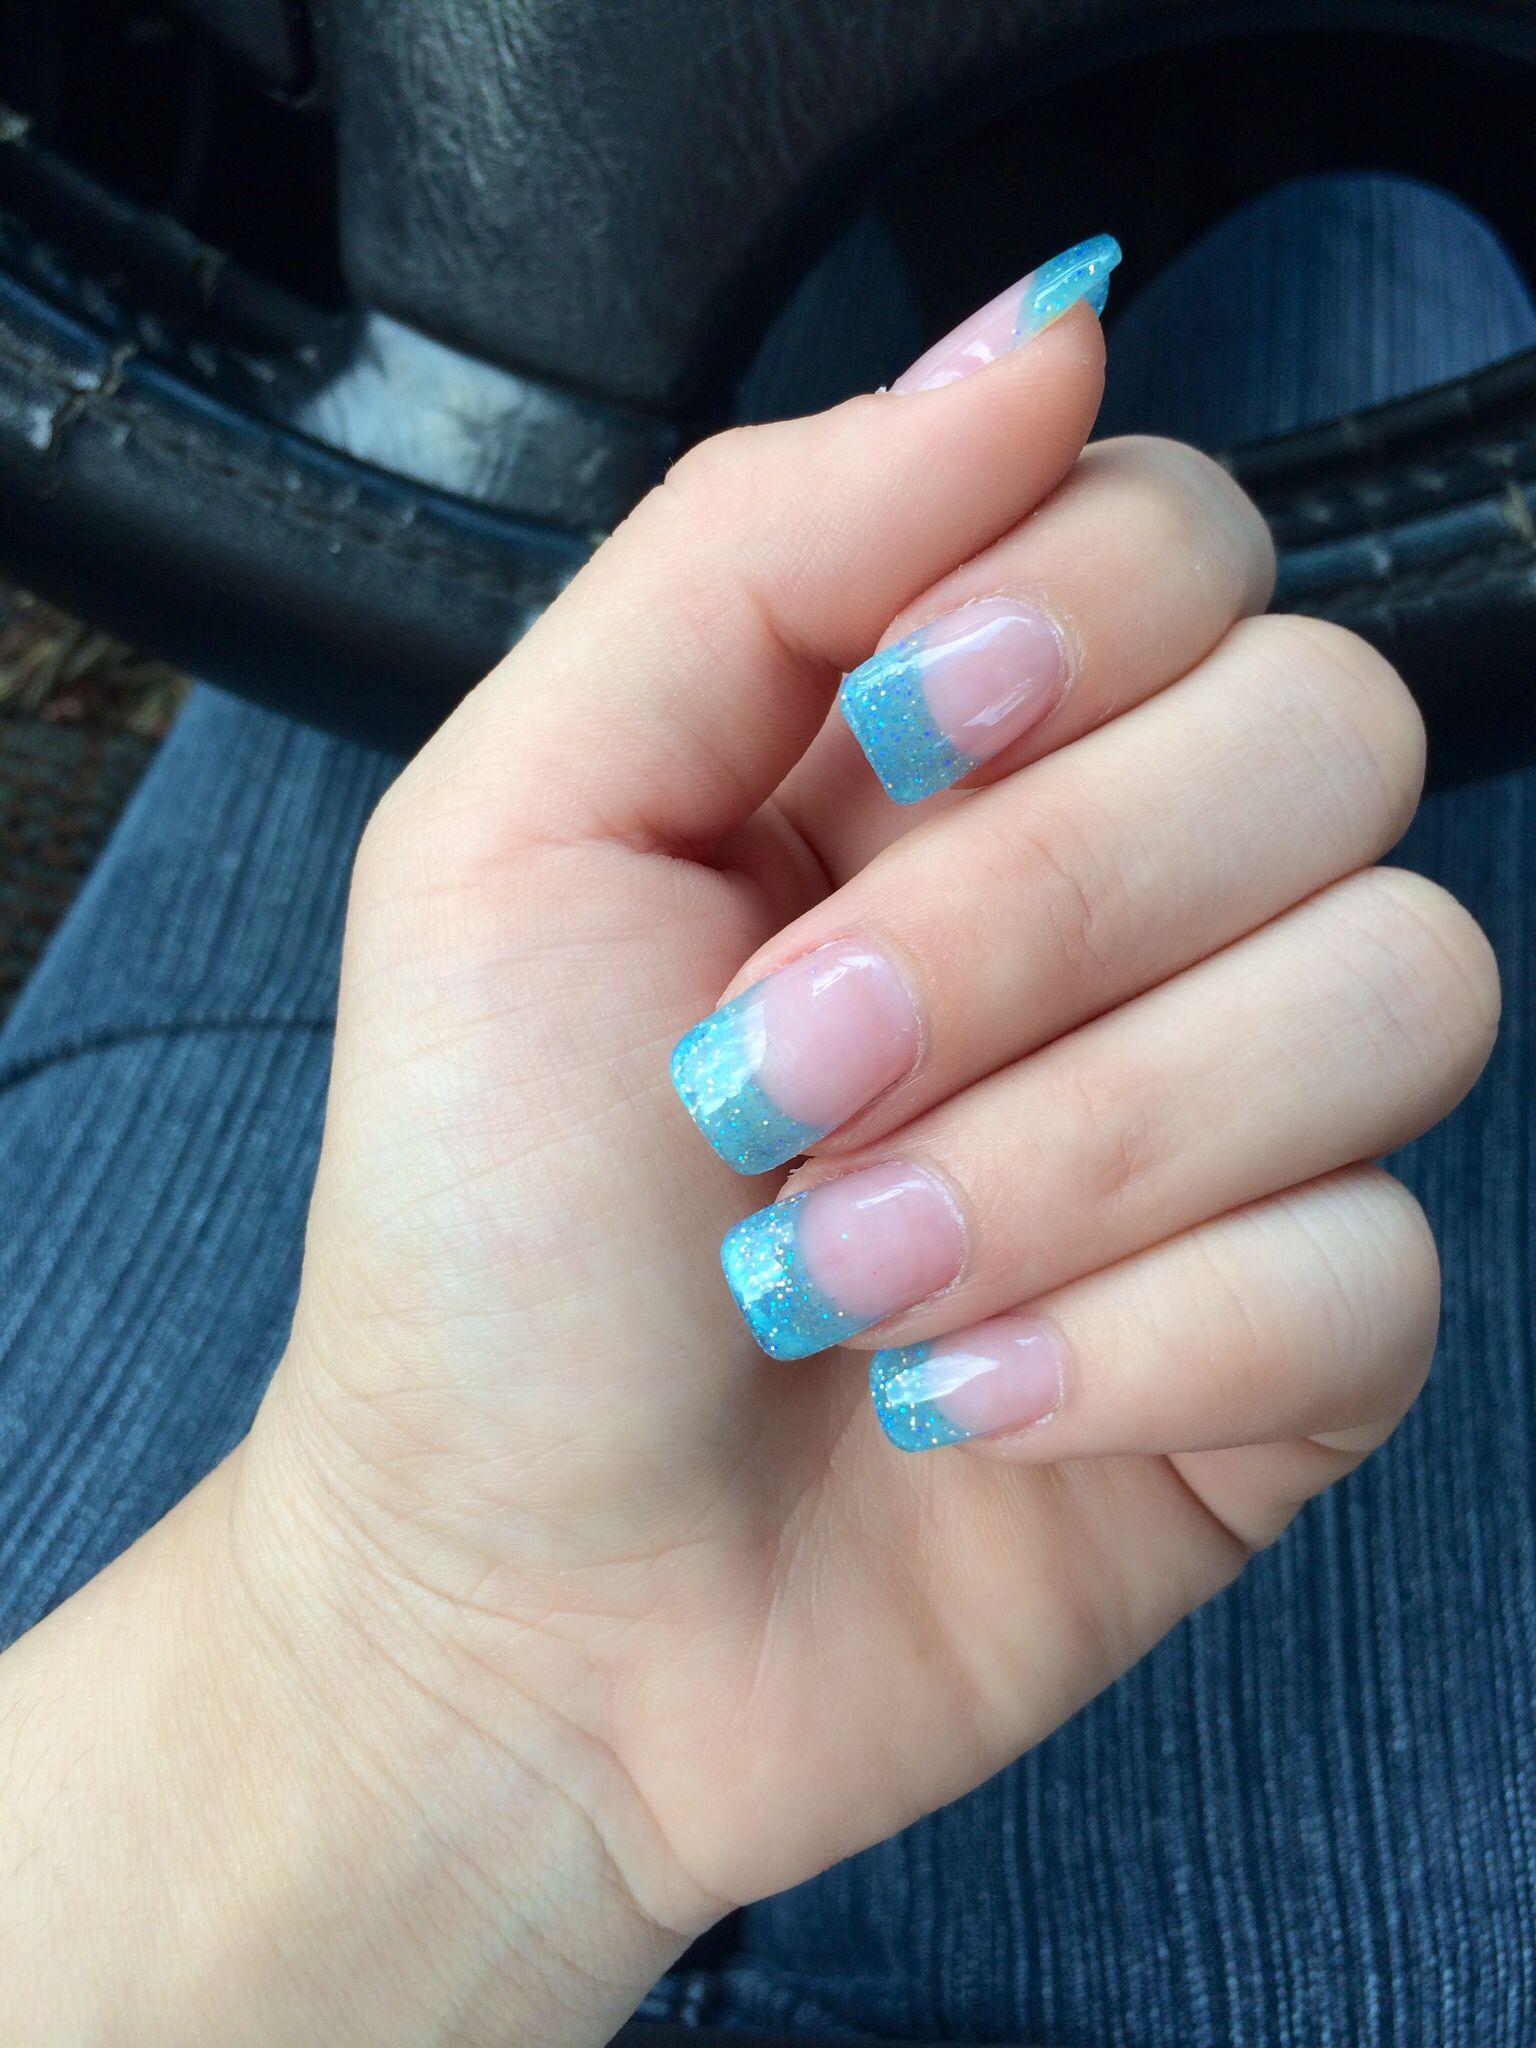 Blue glitter acrylic nails| French tip nails| acrylic ...